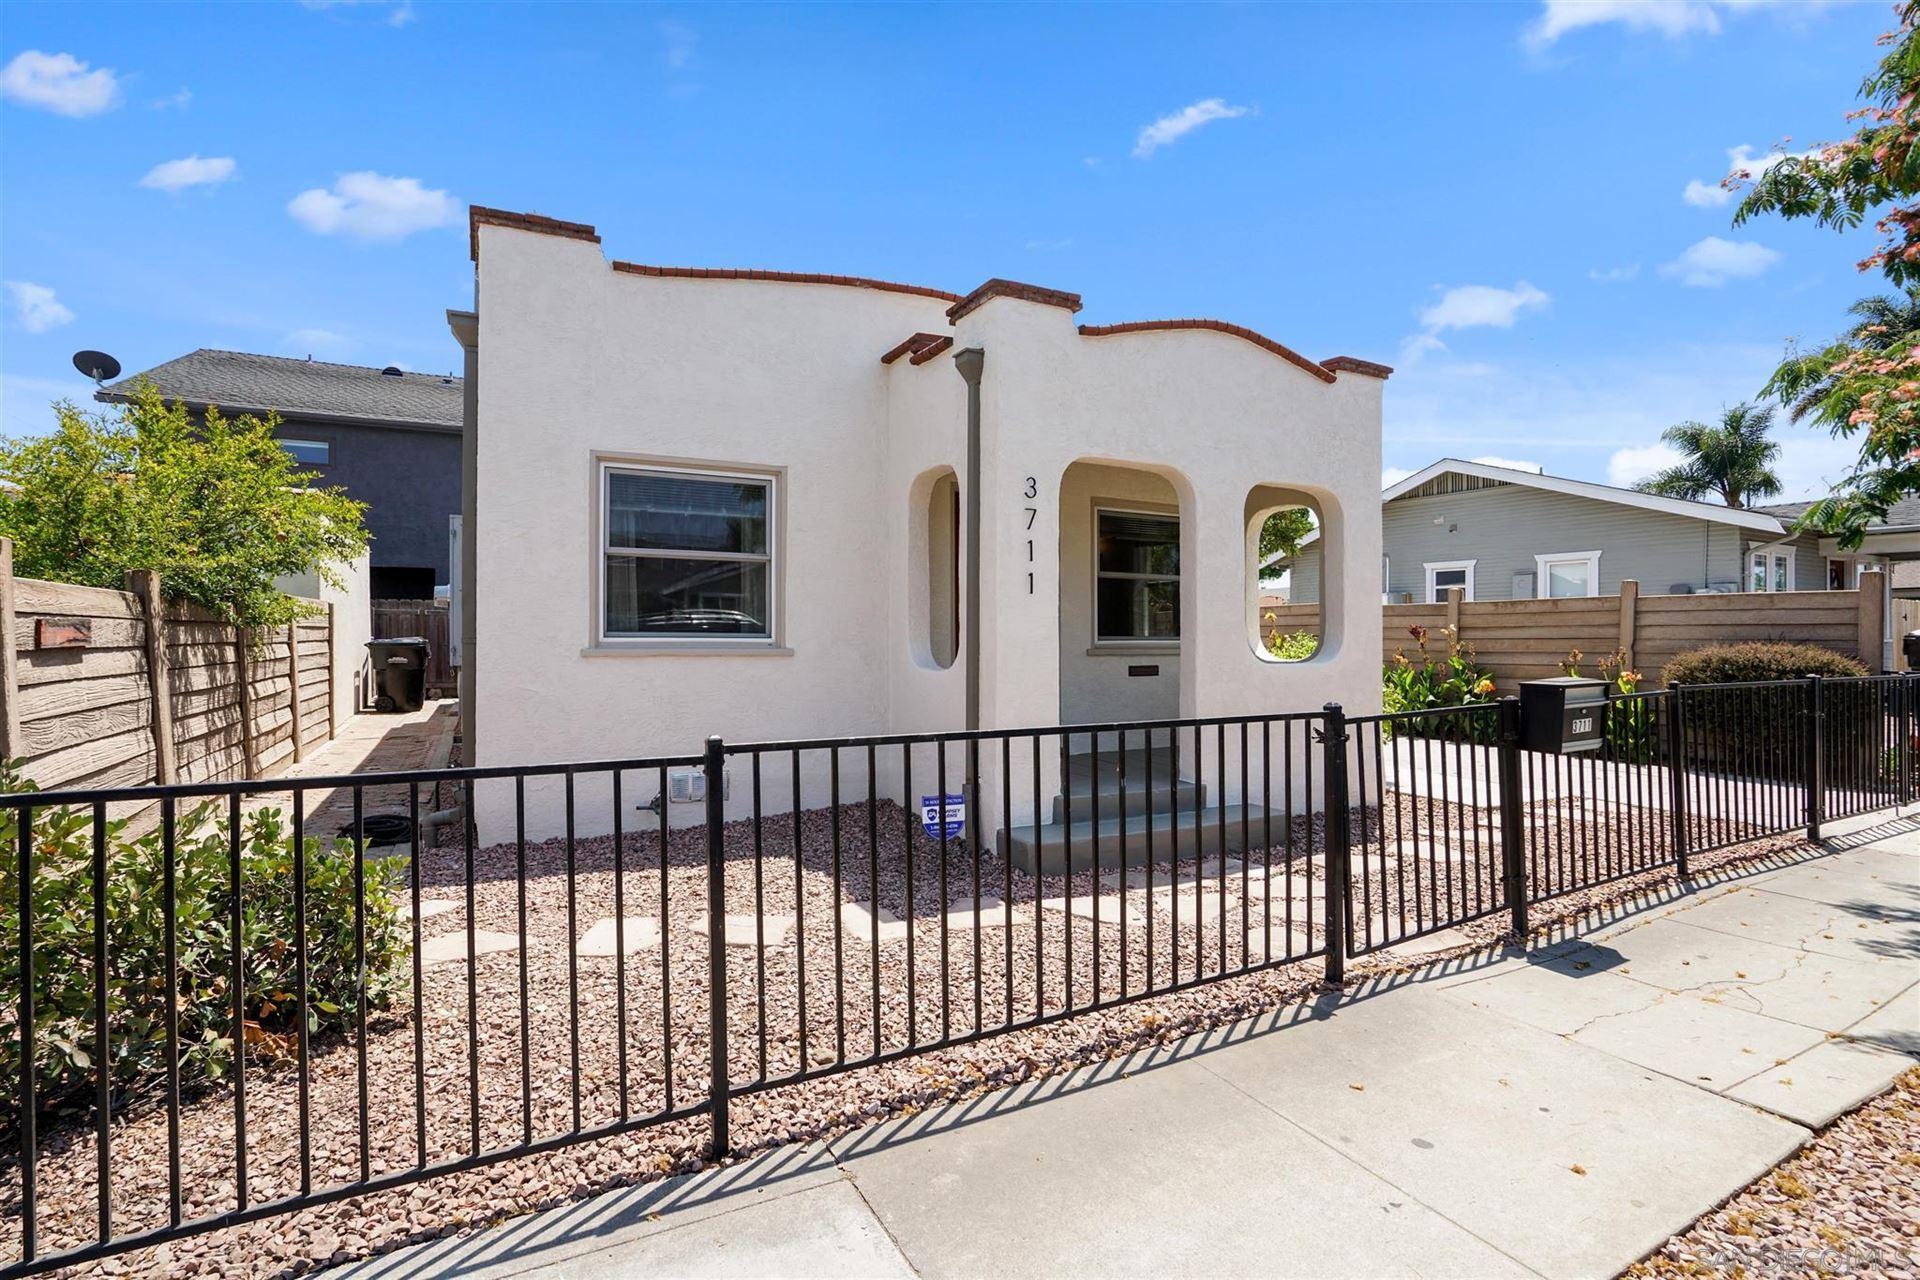 3711 Meade Ave, San Diego, CA 92116 - MLS#: 210020581